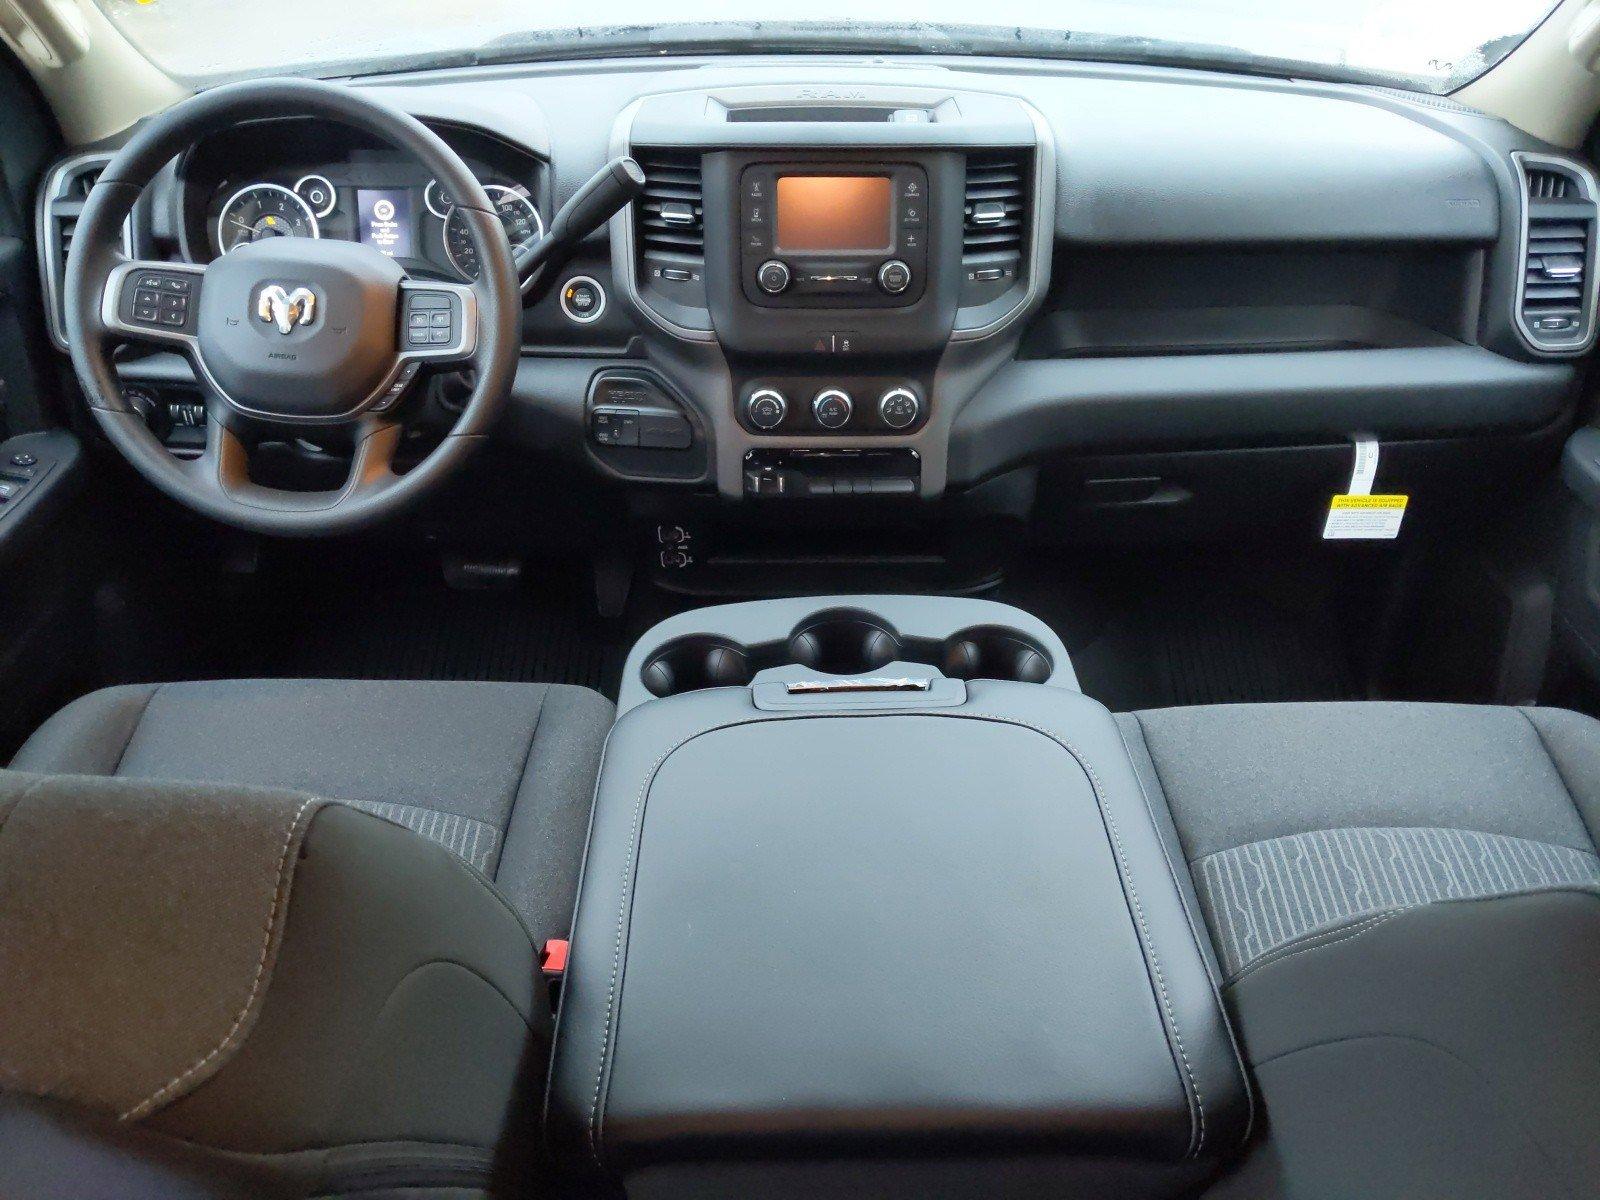 New 2020 Ram 2500 Tradesman Crew Cab Pickup for sale in Grand Island NE